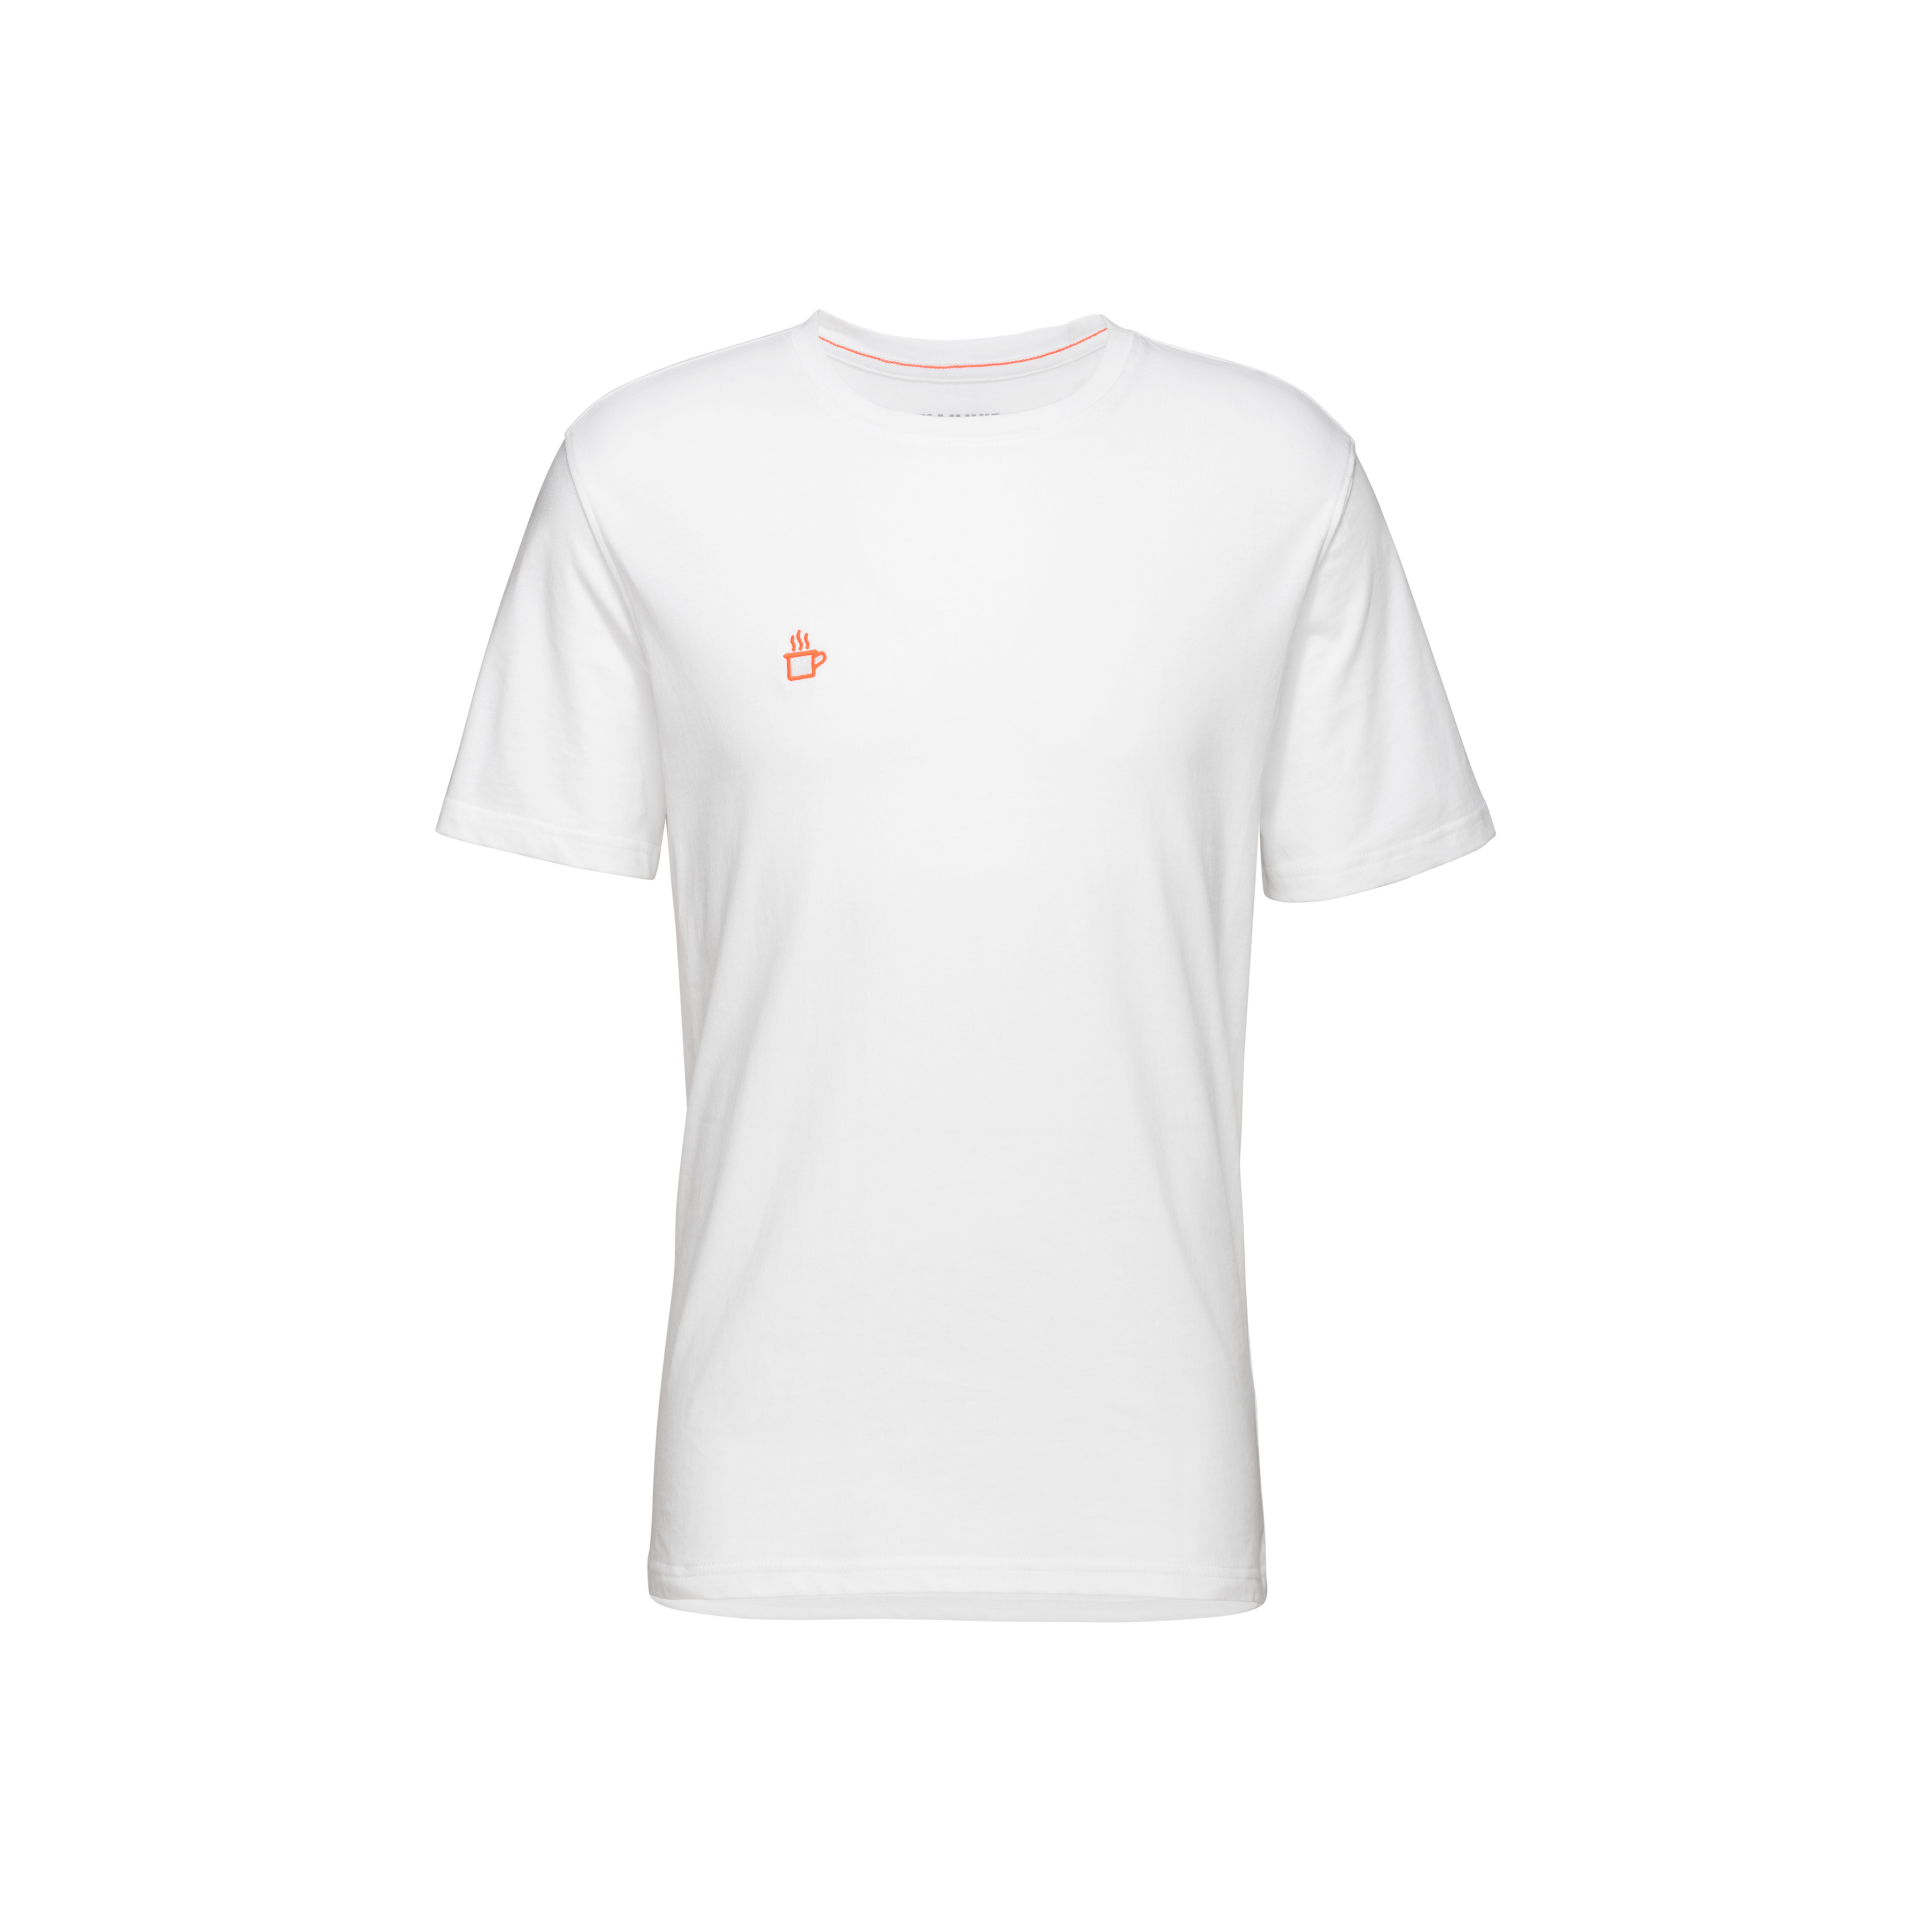 Mammut Essential T-Shirt - white cup, XS thumbnail